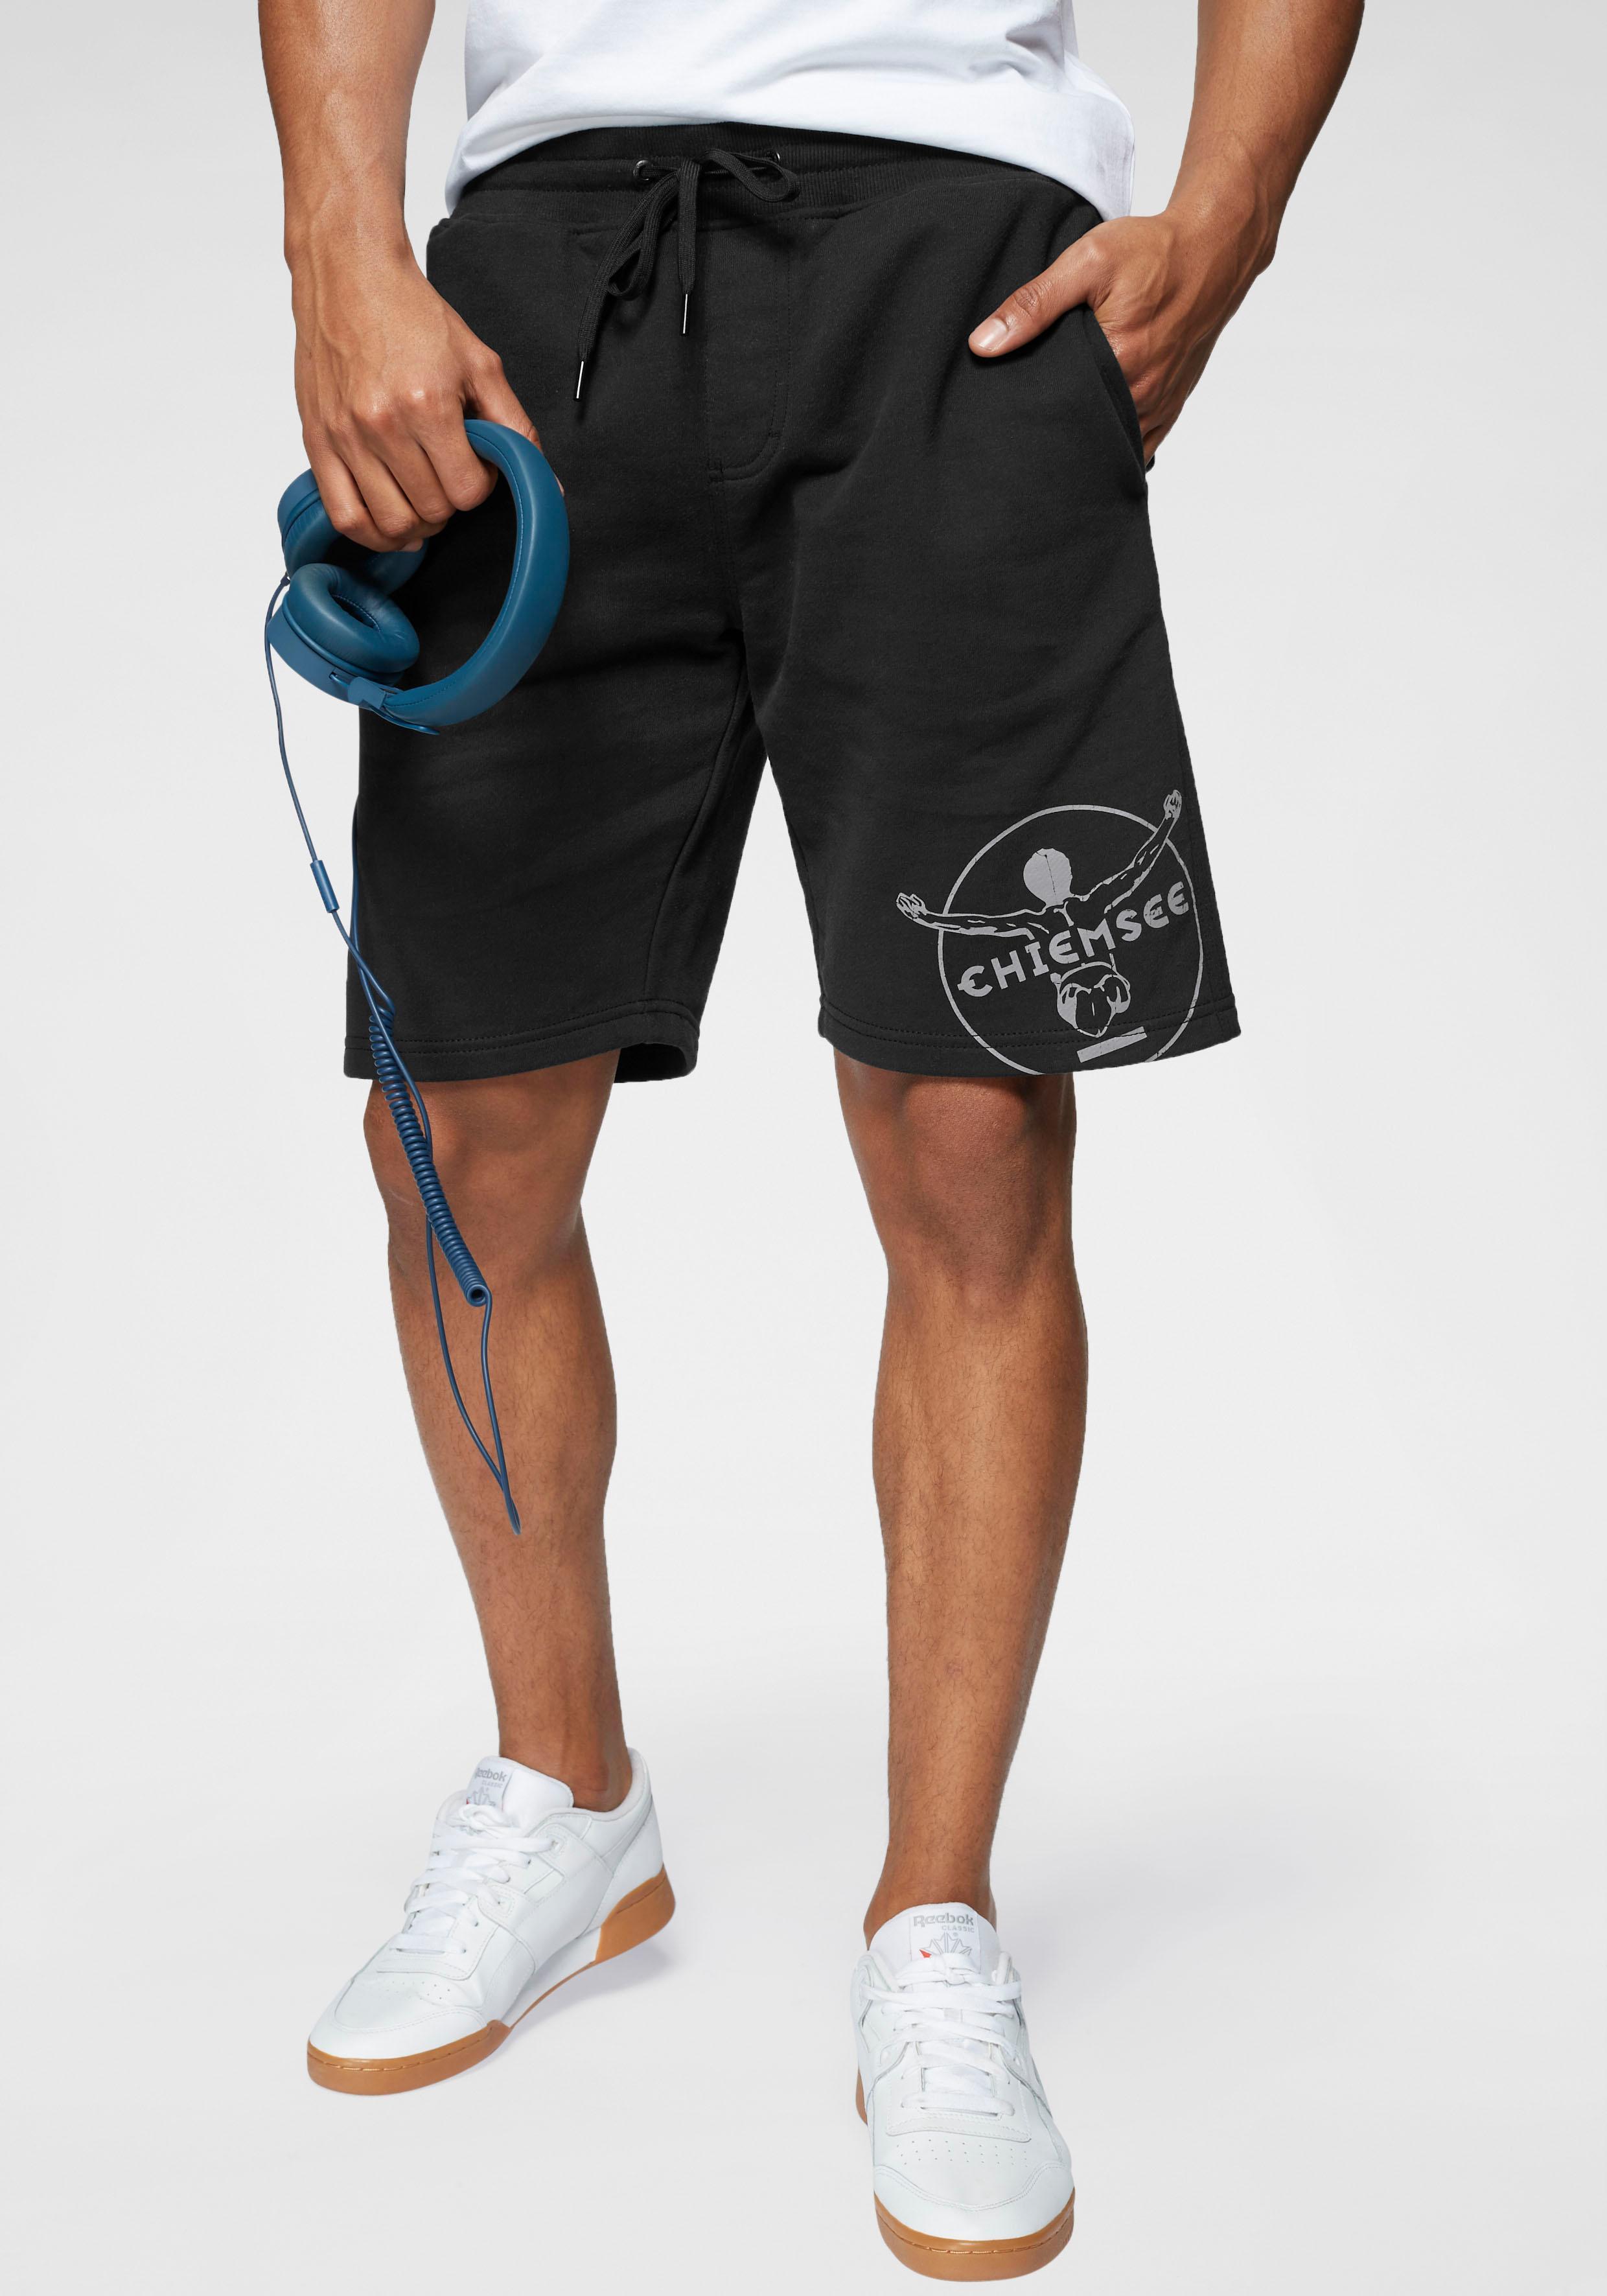 Chiemsee Sweatshorts | Bekleidung > Shorts & Bermudas > Shorts | Chiemsee